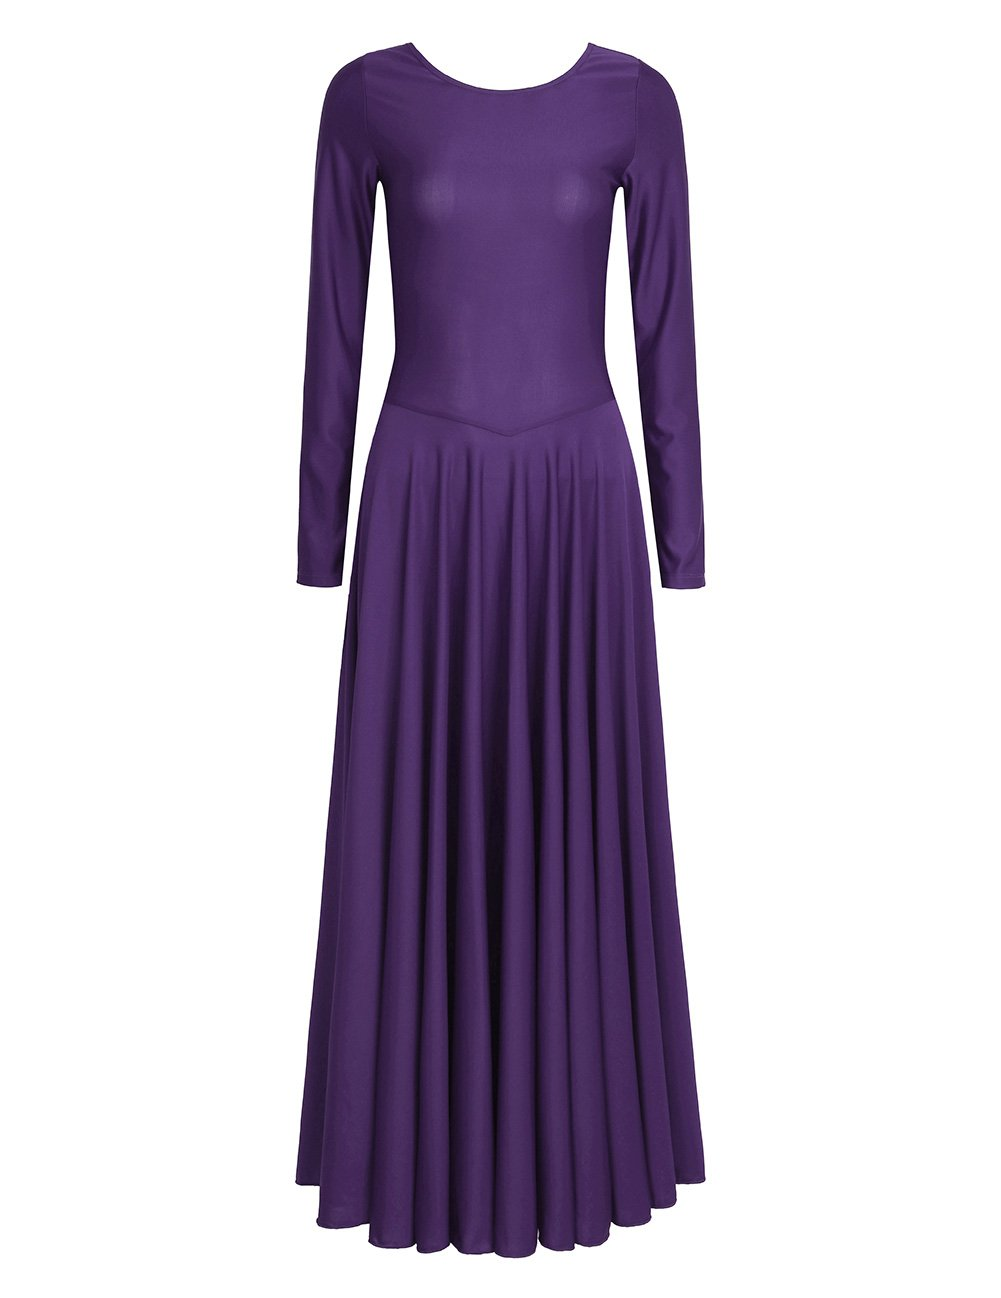 iiniim Womens Liturgical Praise Loose Fit Full Length Long Sleeve Dance Dress Purple Large